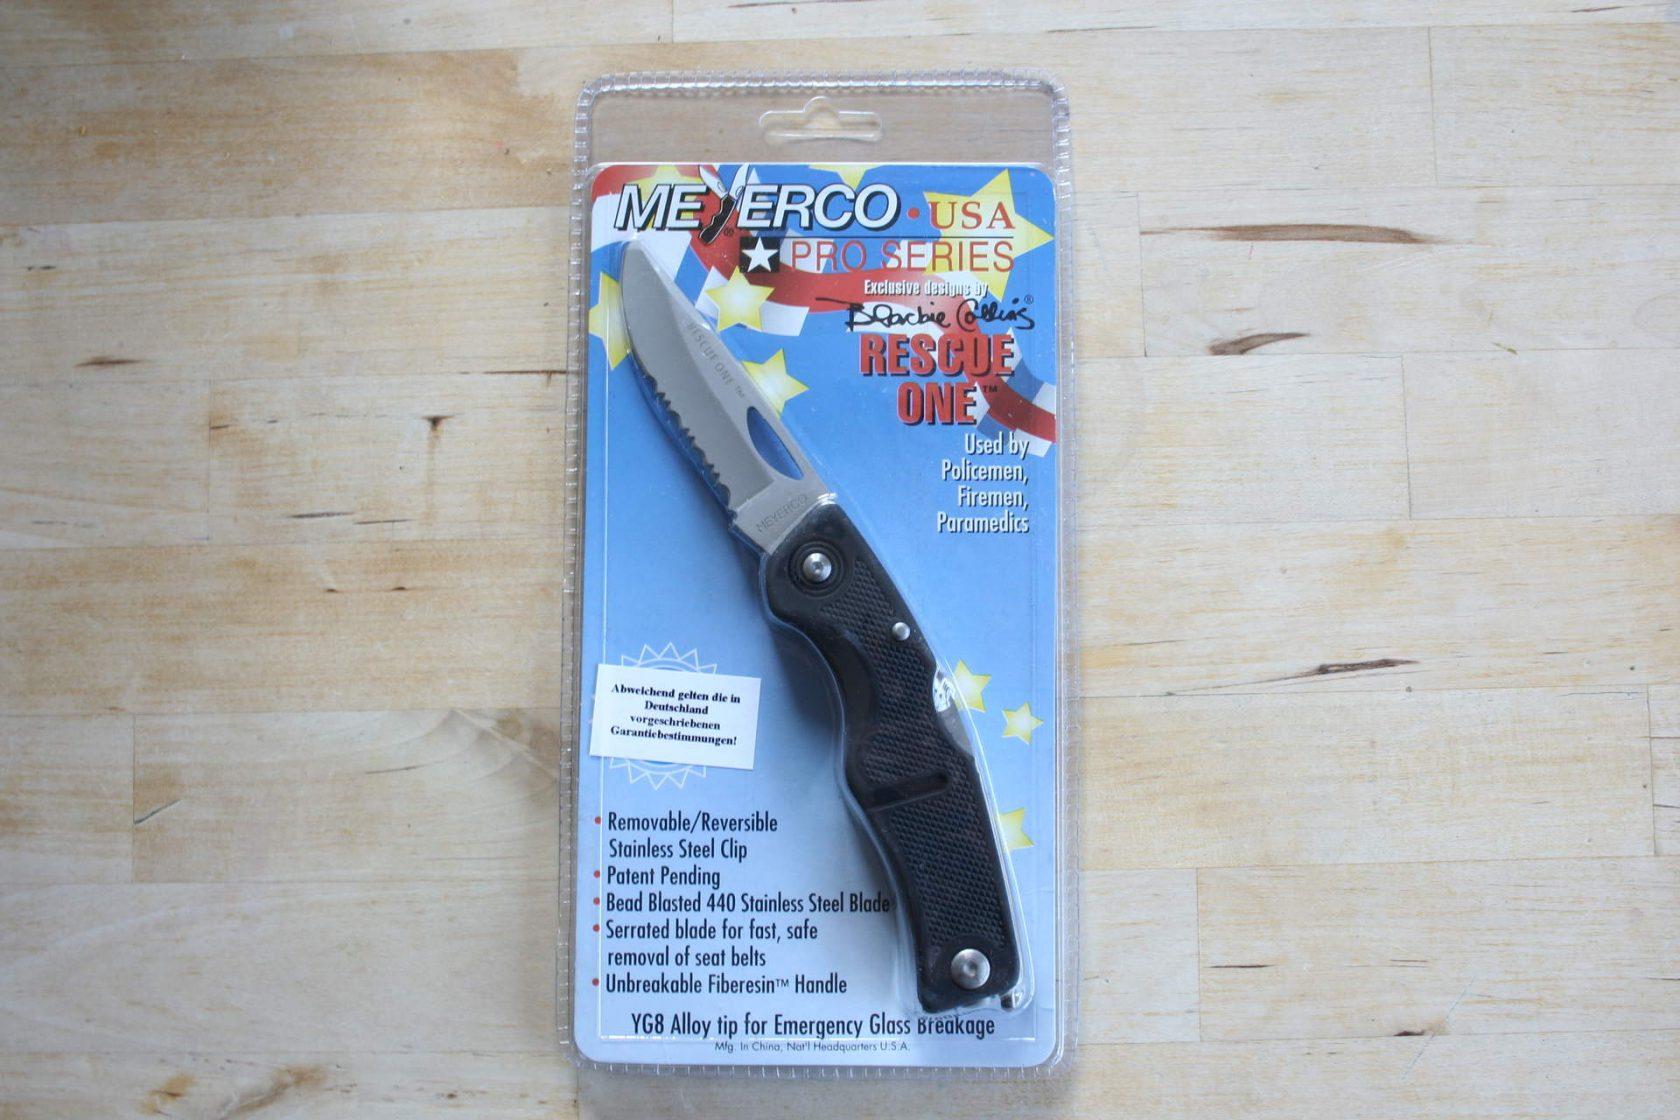 meyerco-rescue-one-01